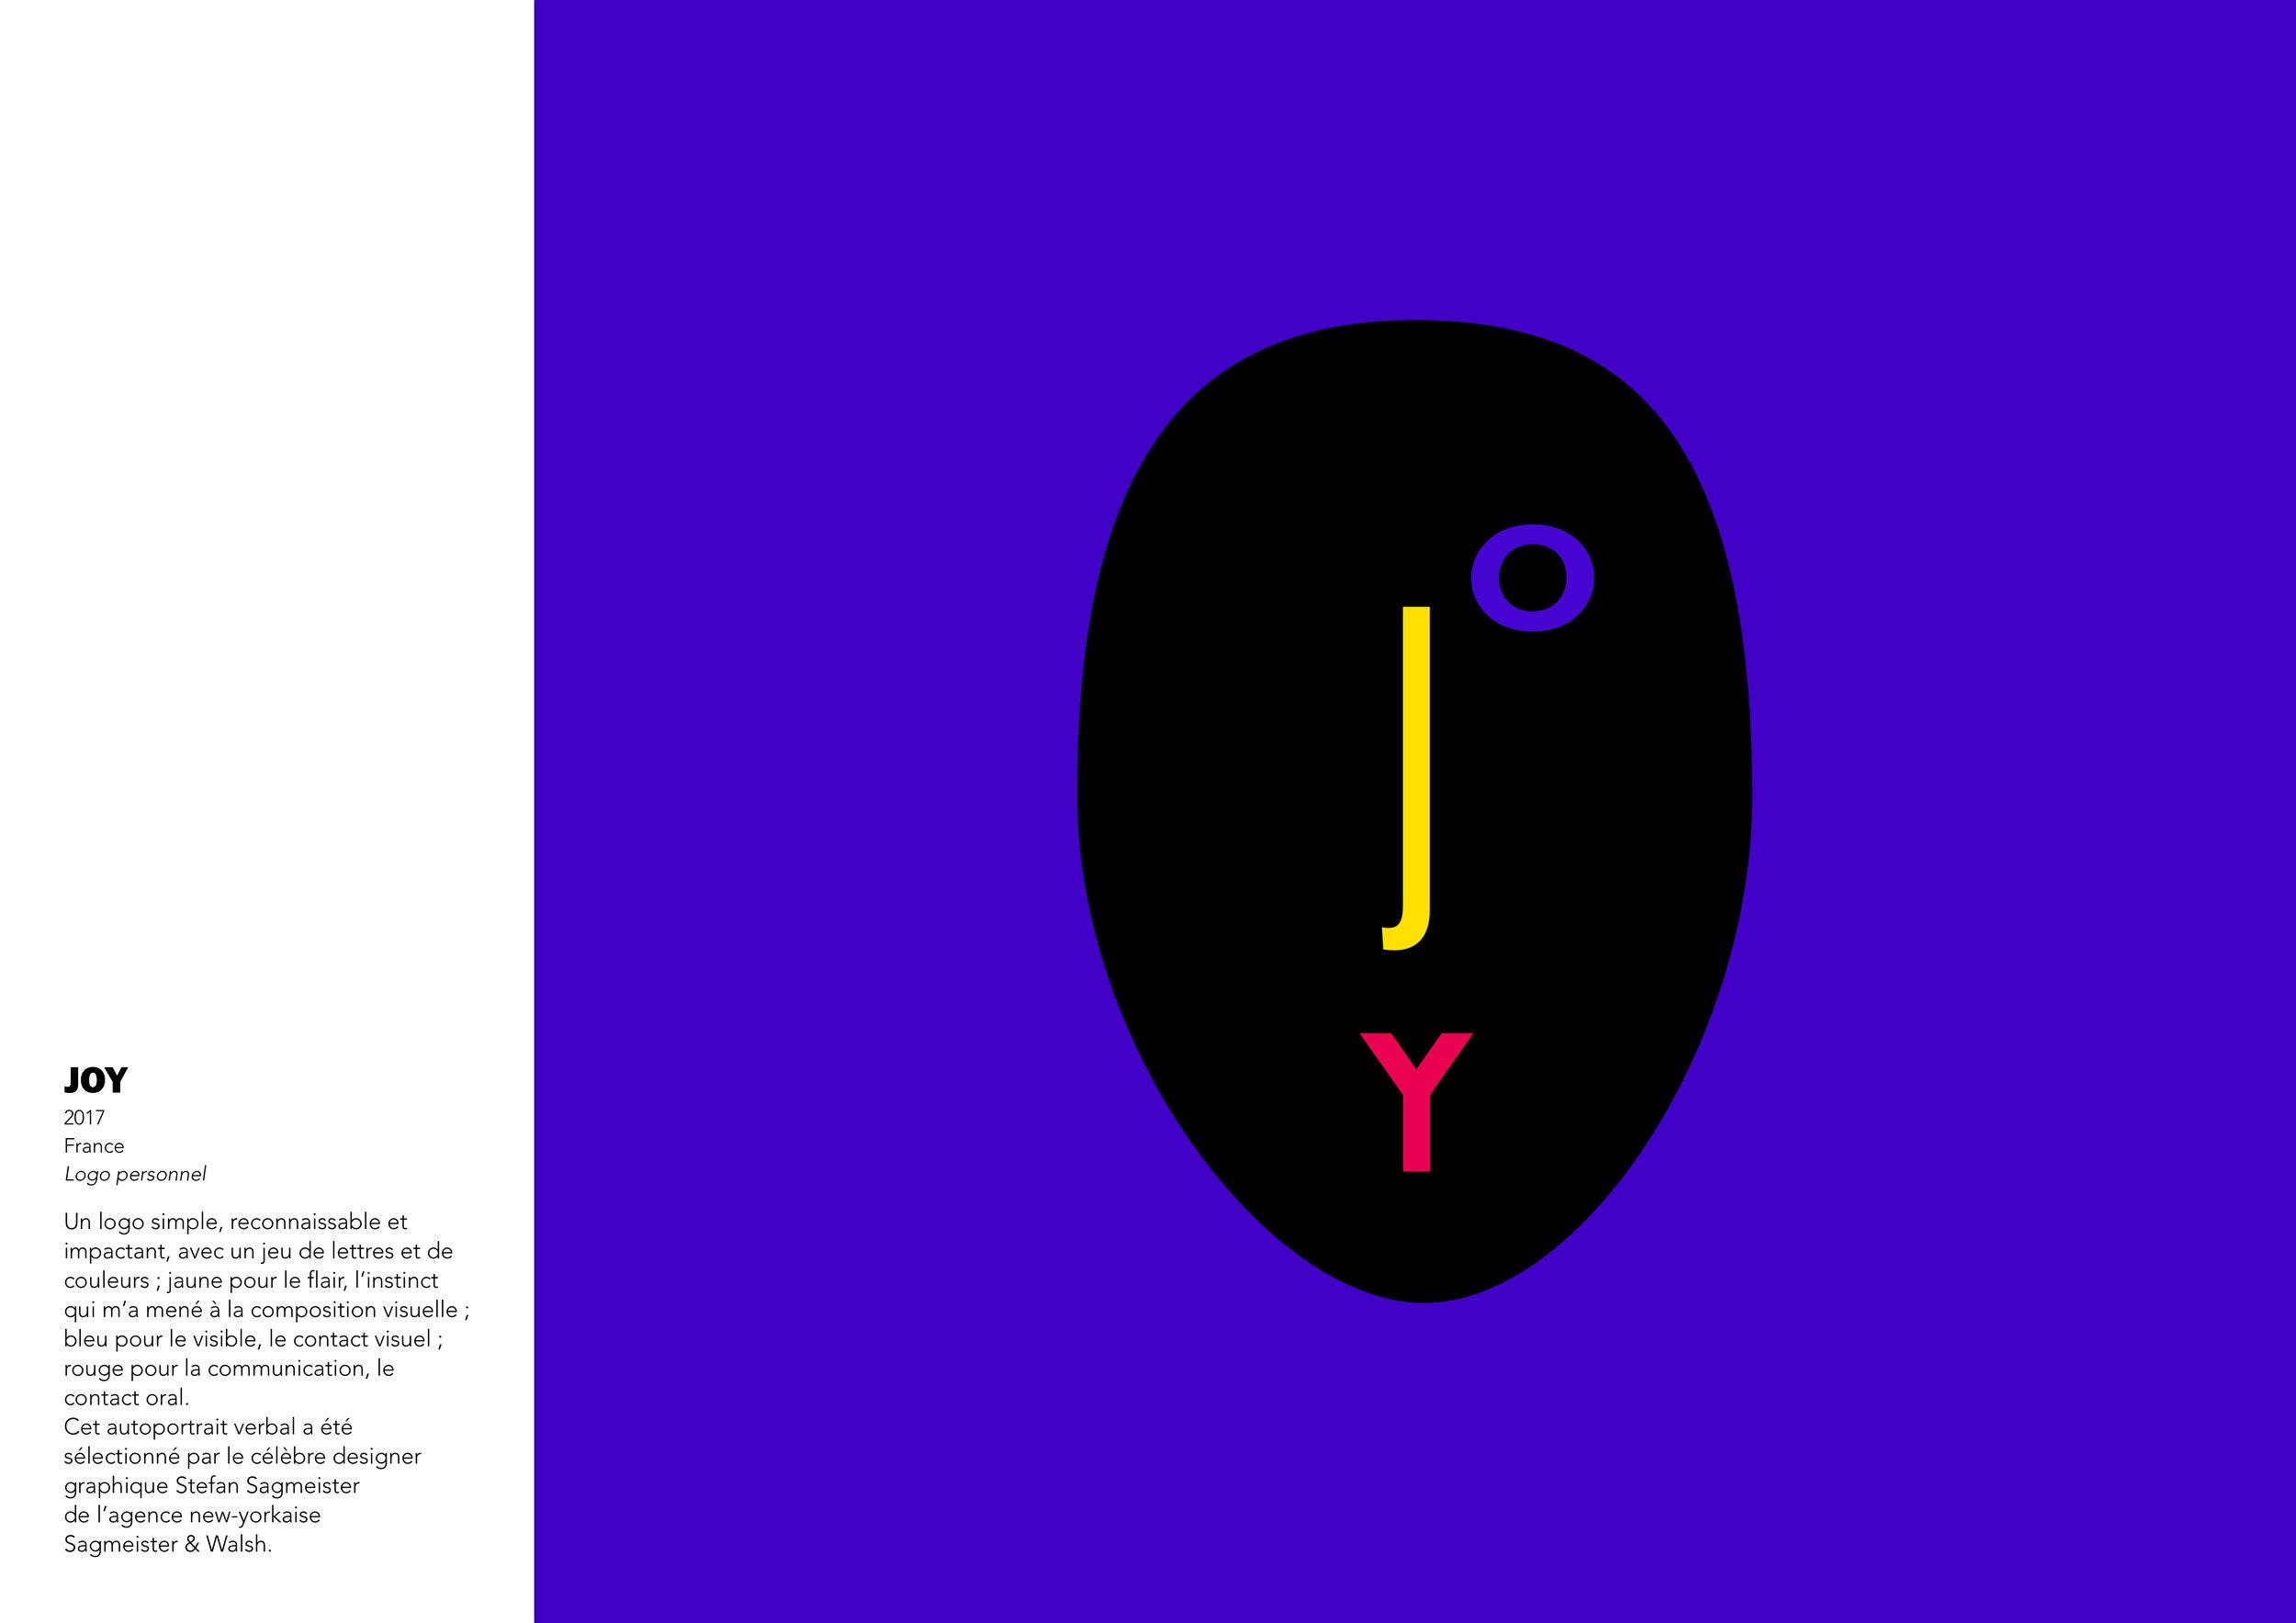 JOY-selfportrait-joy-lasry-logo-design-identity.jpg